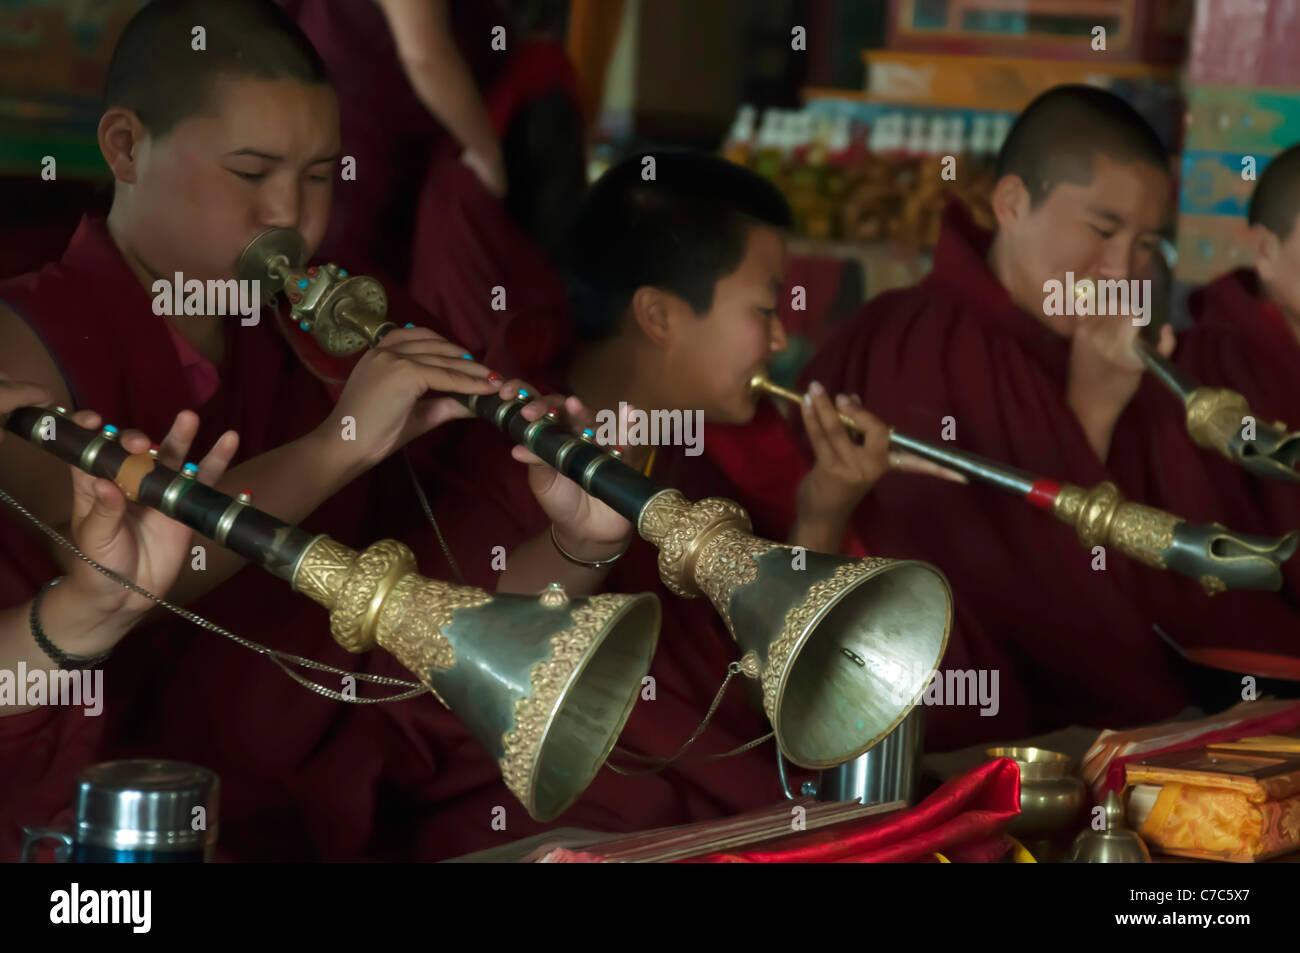 Sherpa Buddhist monks performing ceremonies at the Ani Gumba Monastery, outside Kathmandu - Stock Image